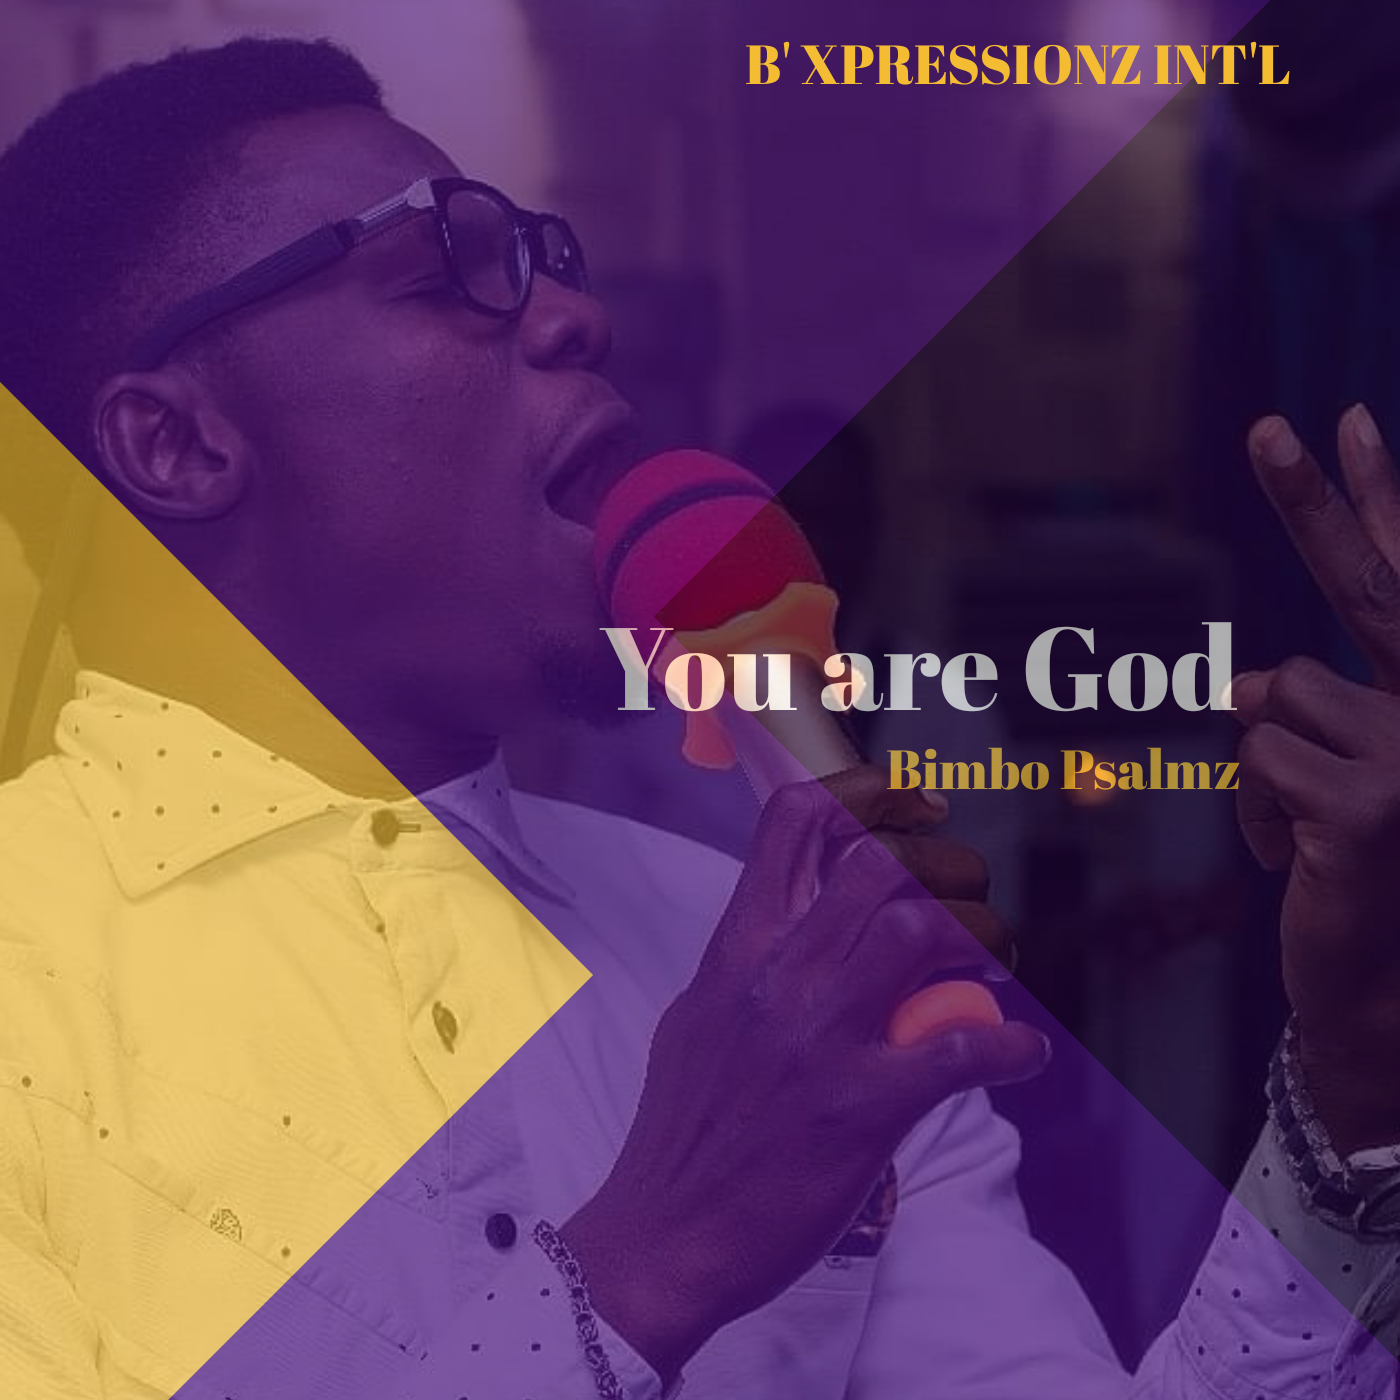 Lyrics] YOU ARE GOD - Bimbo Psalmz @bimbopsalmzofficial